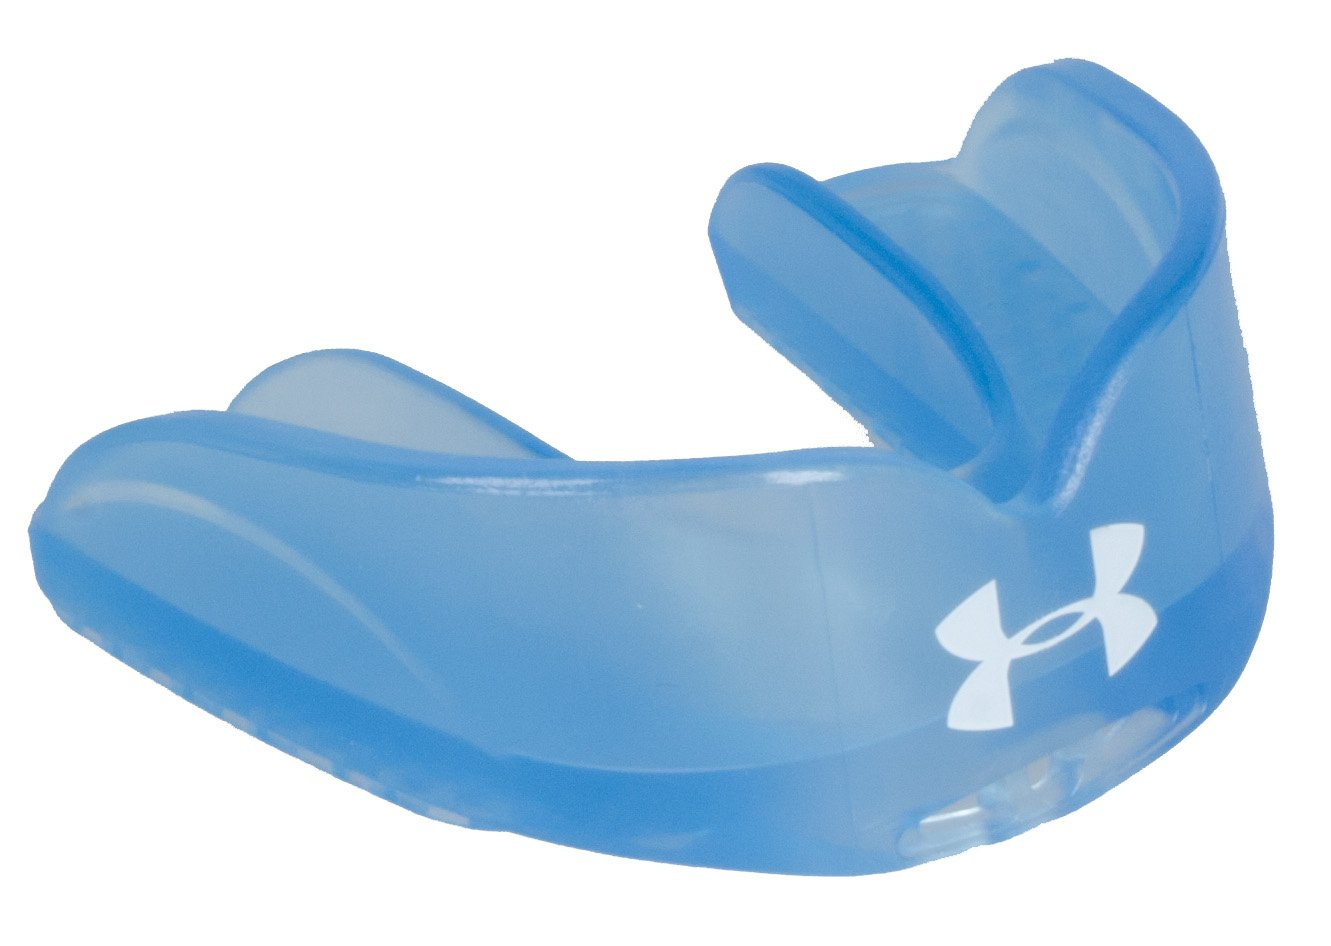 Under Armour Braces Mouthguard Strapless - Adult Blue Aci Brands R-2-1201-A